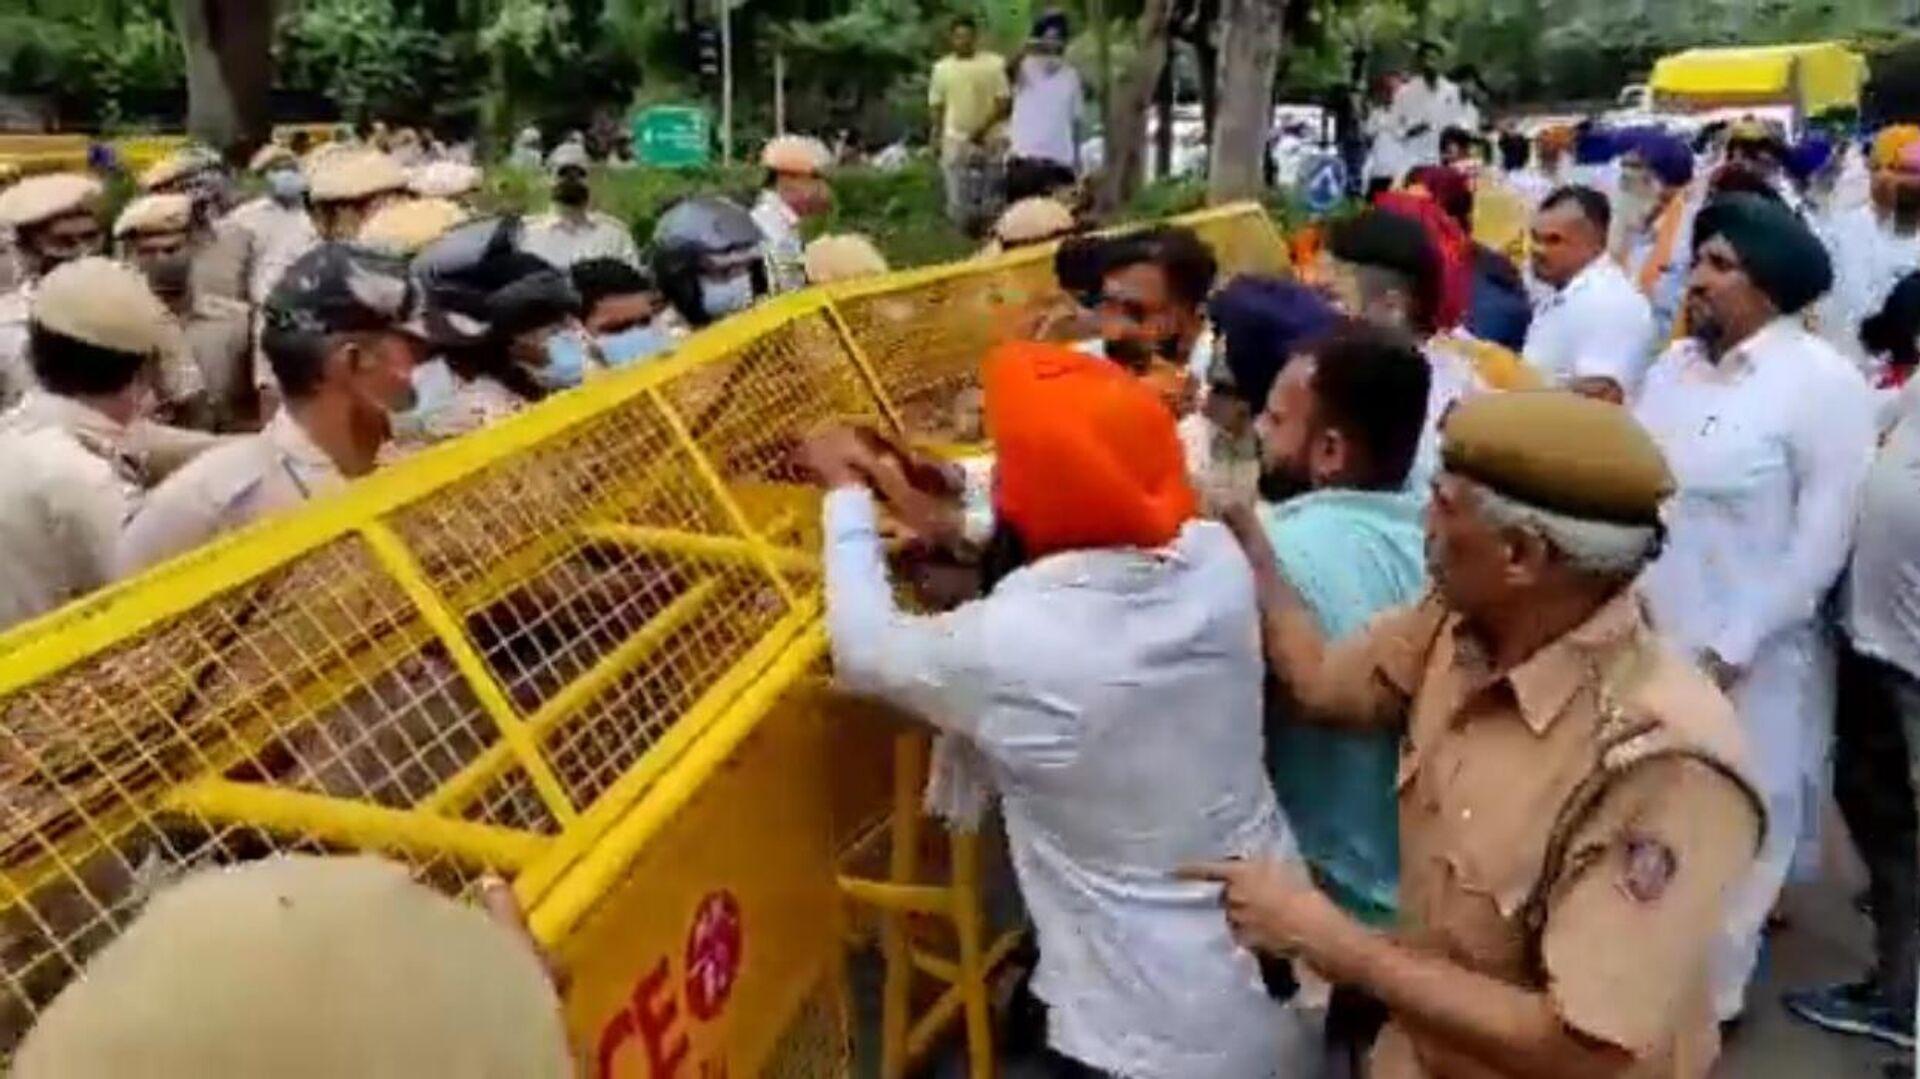 Punjab political activists clash with police in Delhi during anti-farm laws protest - Sputnik International, 1920, 17.09.2021